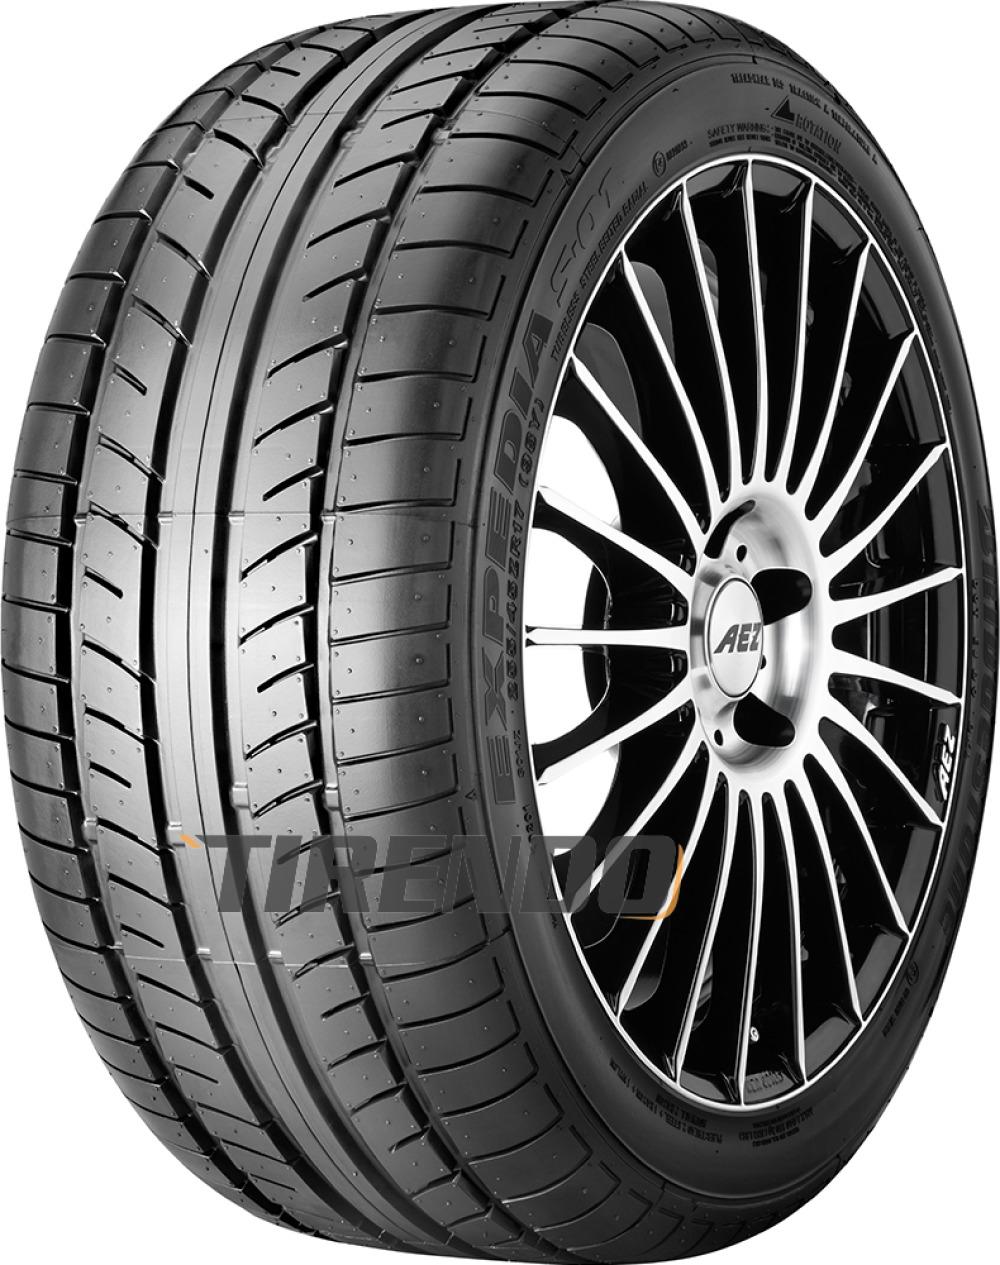 Bridgestone Expedia S-01 ( 255/45 ZR17 (98Y) Doppelmarkierung 98ZR )